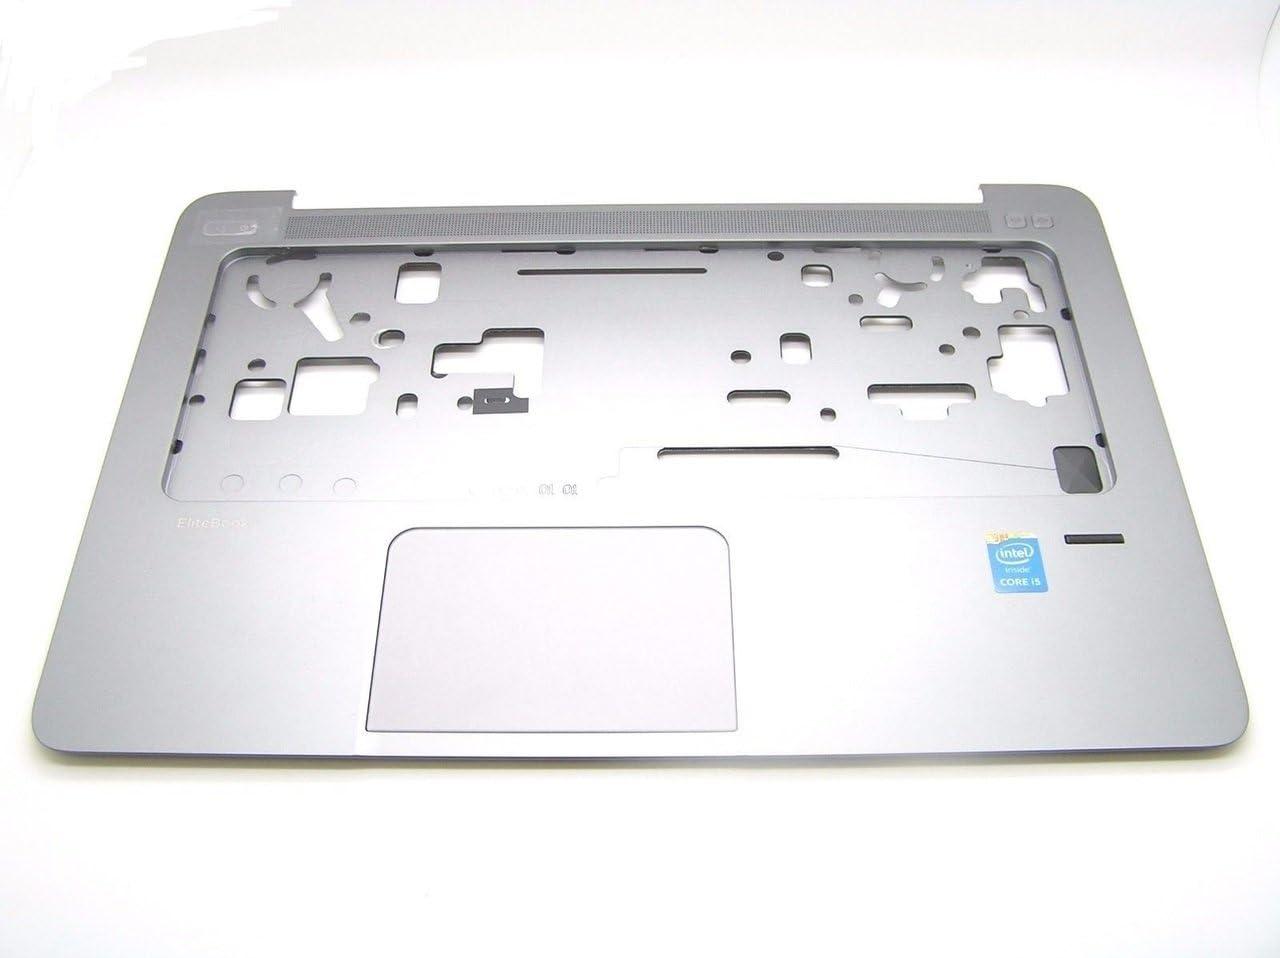 New Genuine HP Elitebook Folio 1040 favorite With G2 G1 Palmrest Touchpad Max 73% OFF